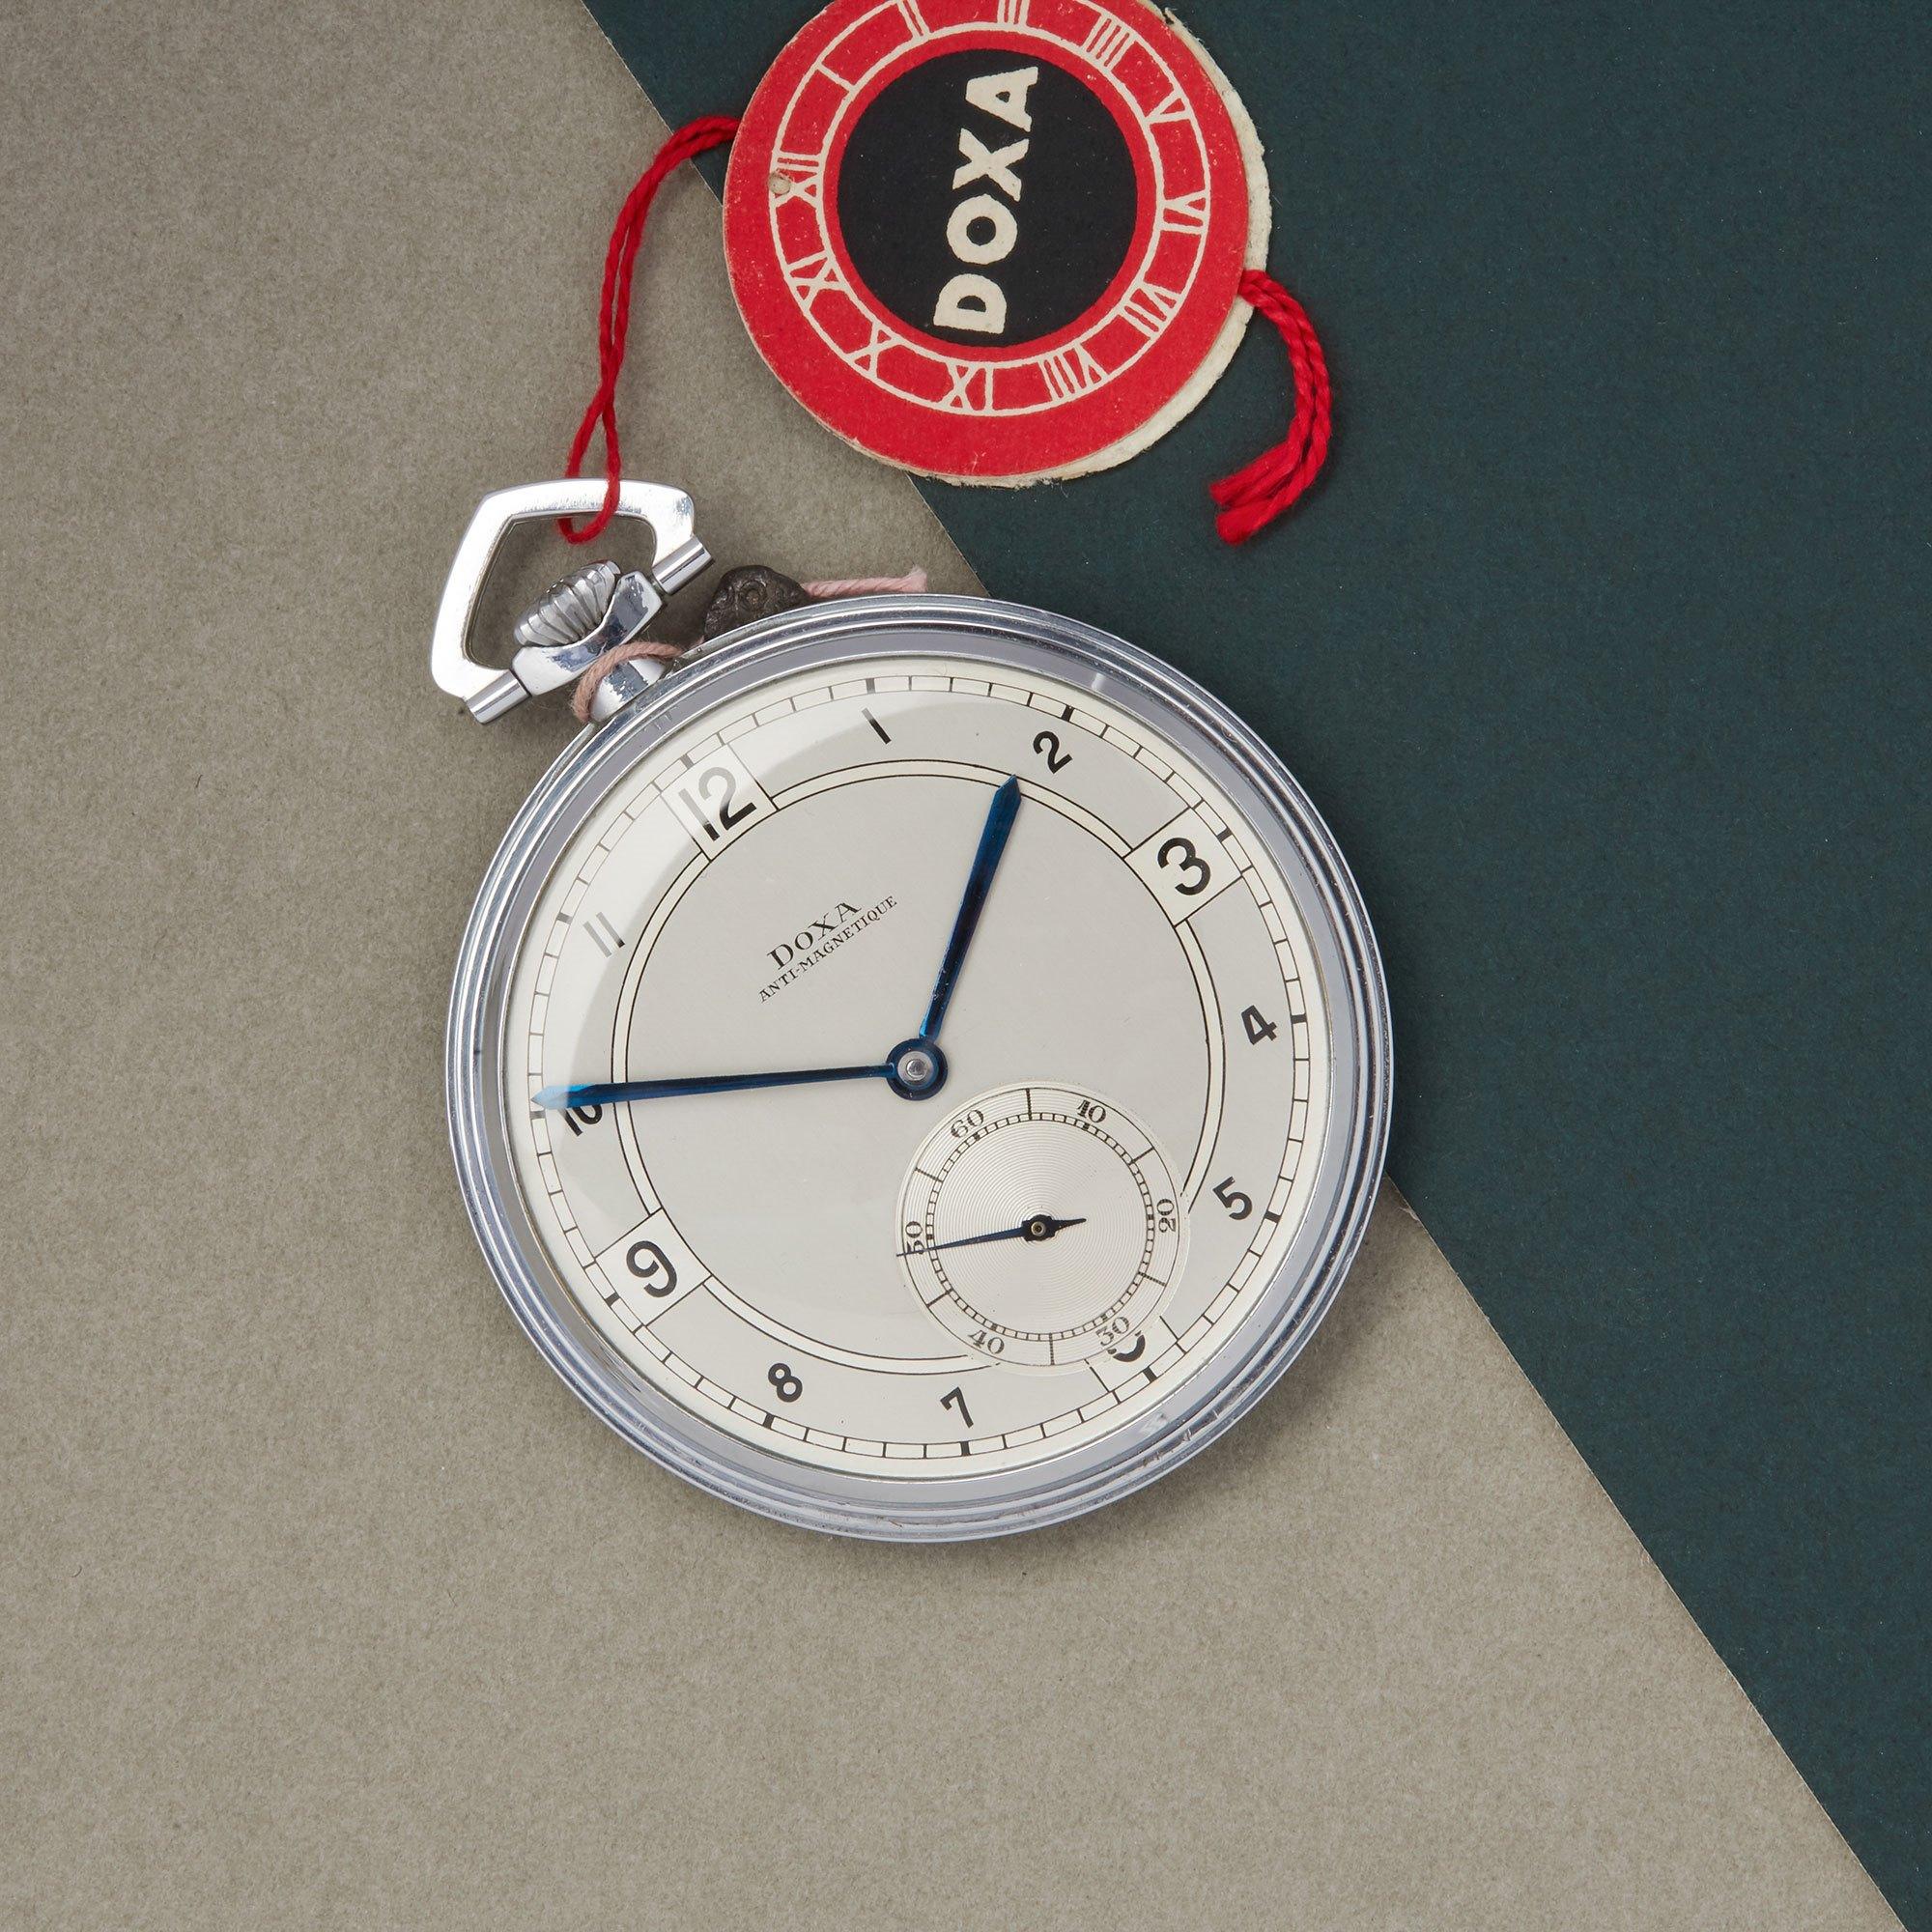 Doxa Pocket Watch NOS Stainless Steel